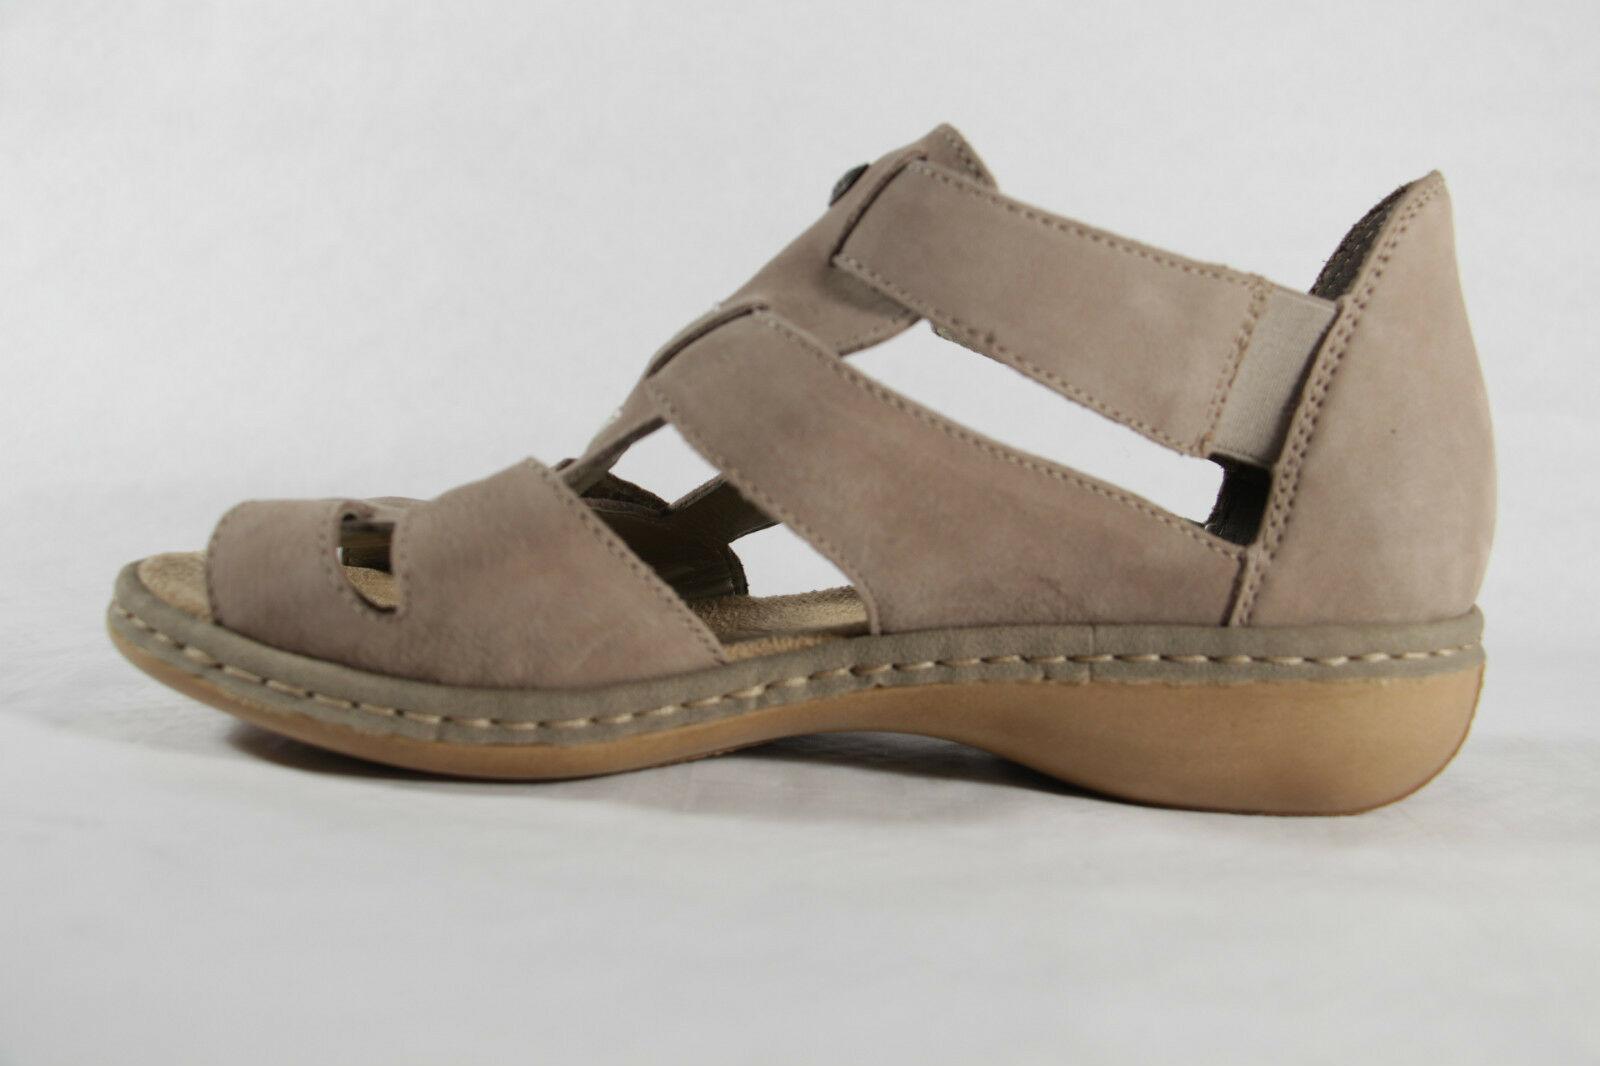 Rieker Damen Sandale, beige, Klettverschluß, weiche bnl1l